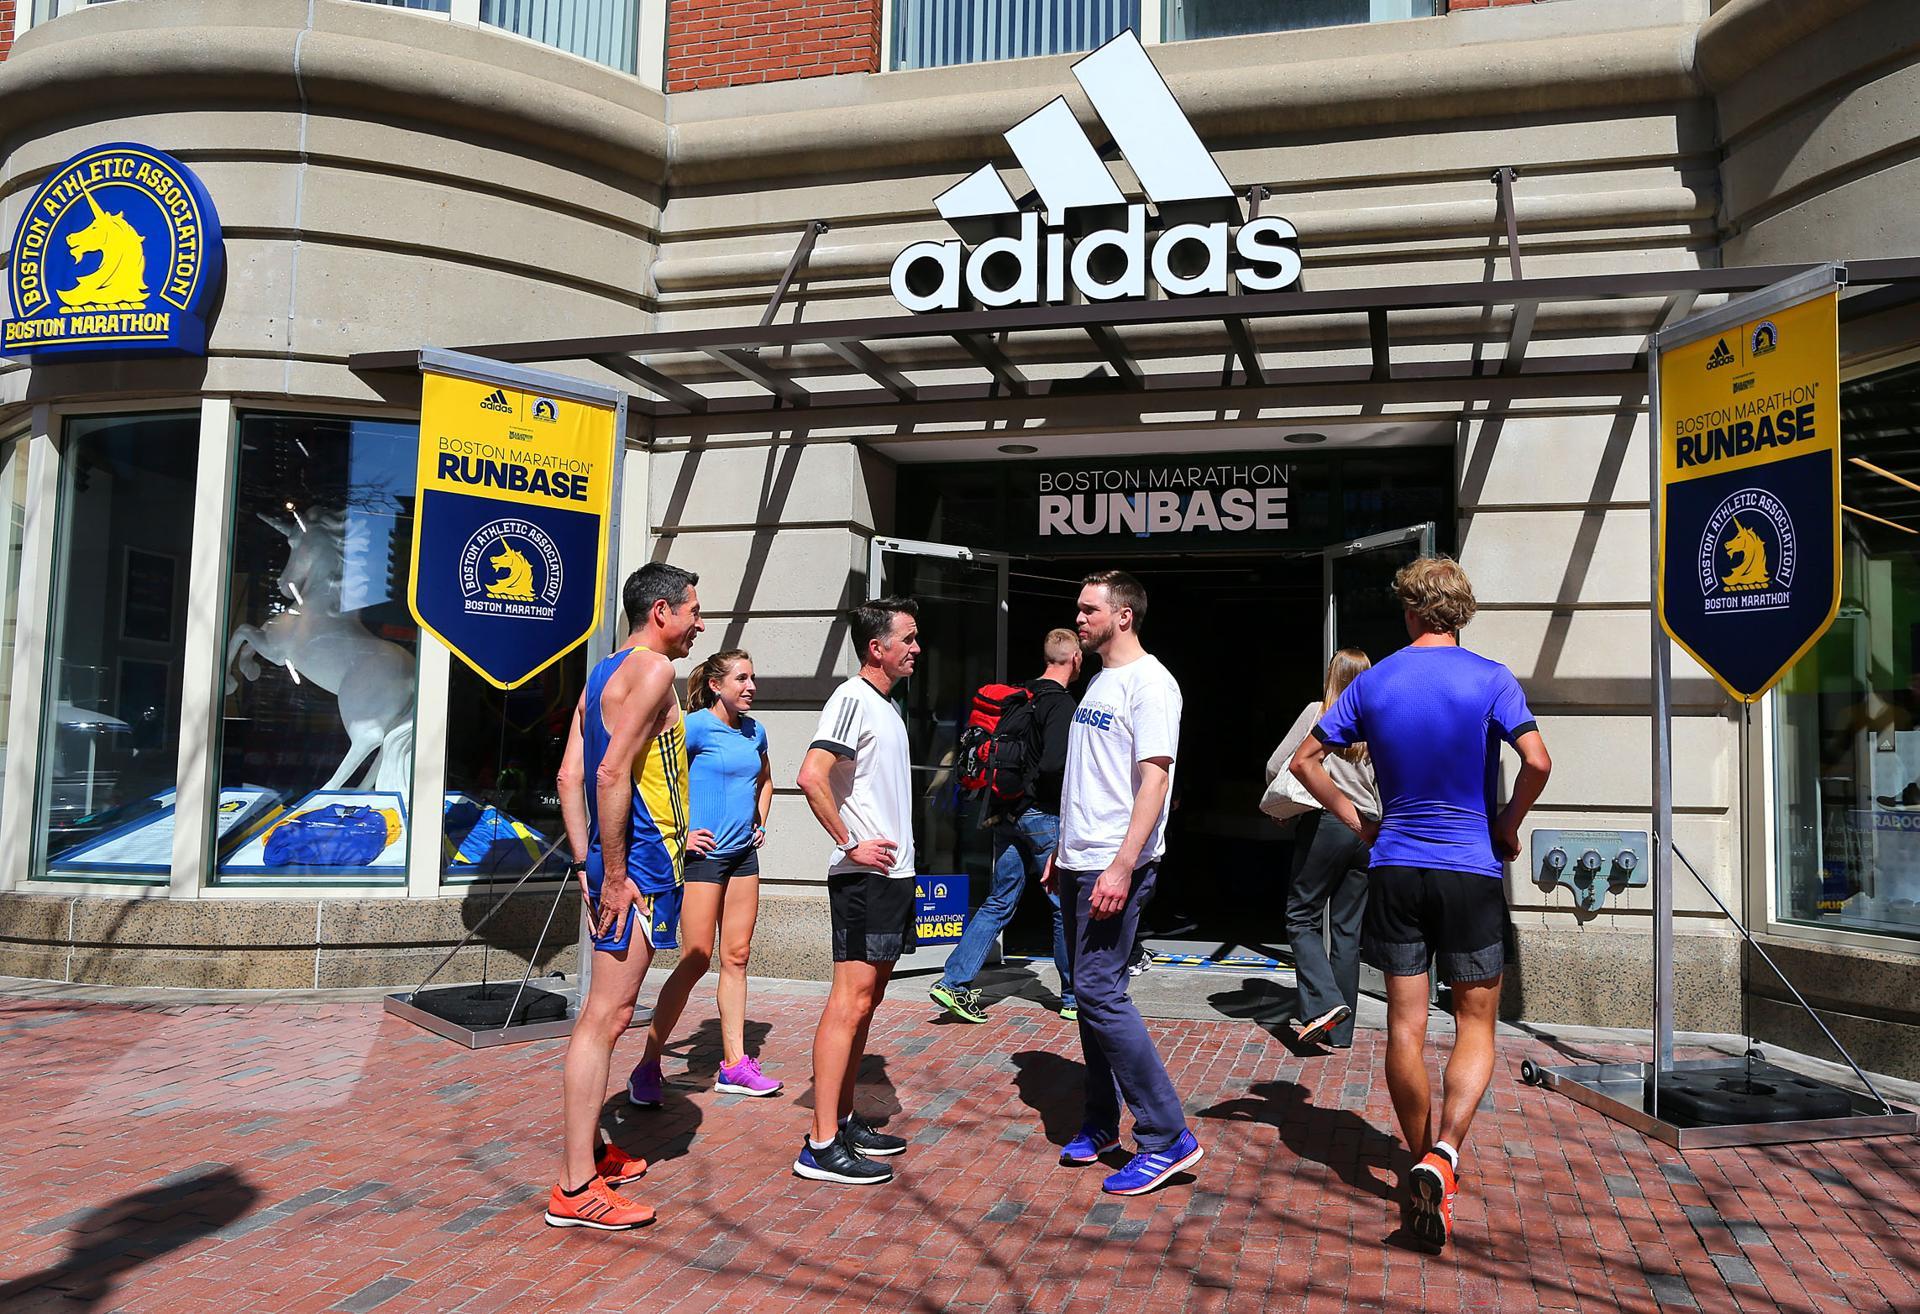 adidas retail store in boston